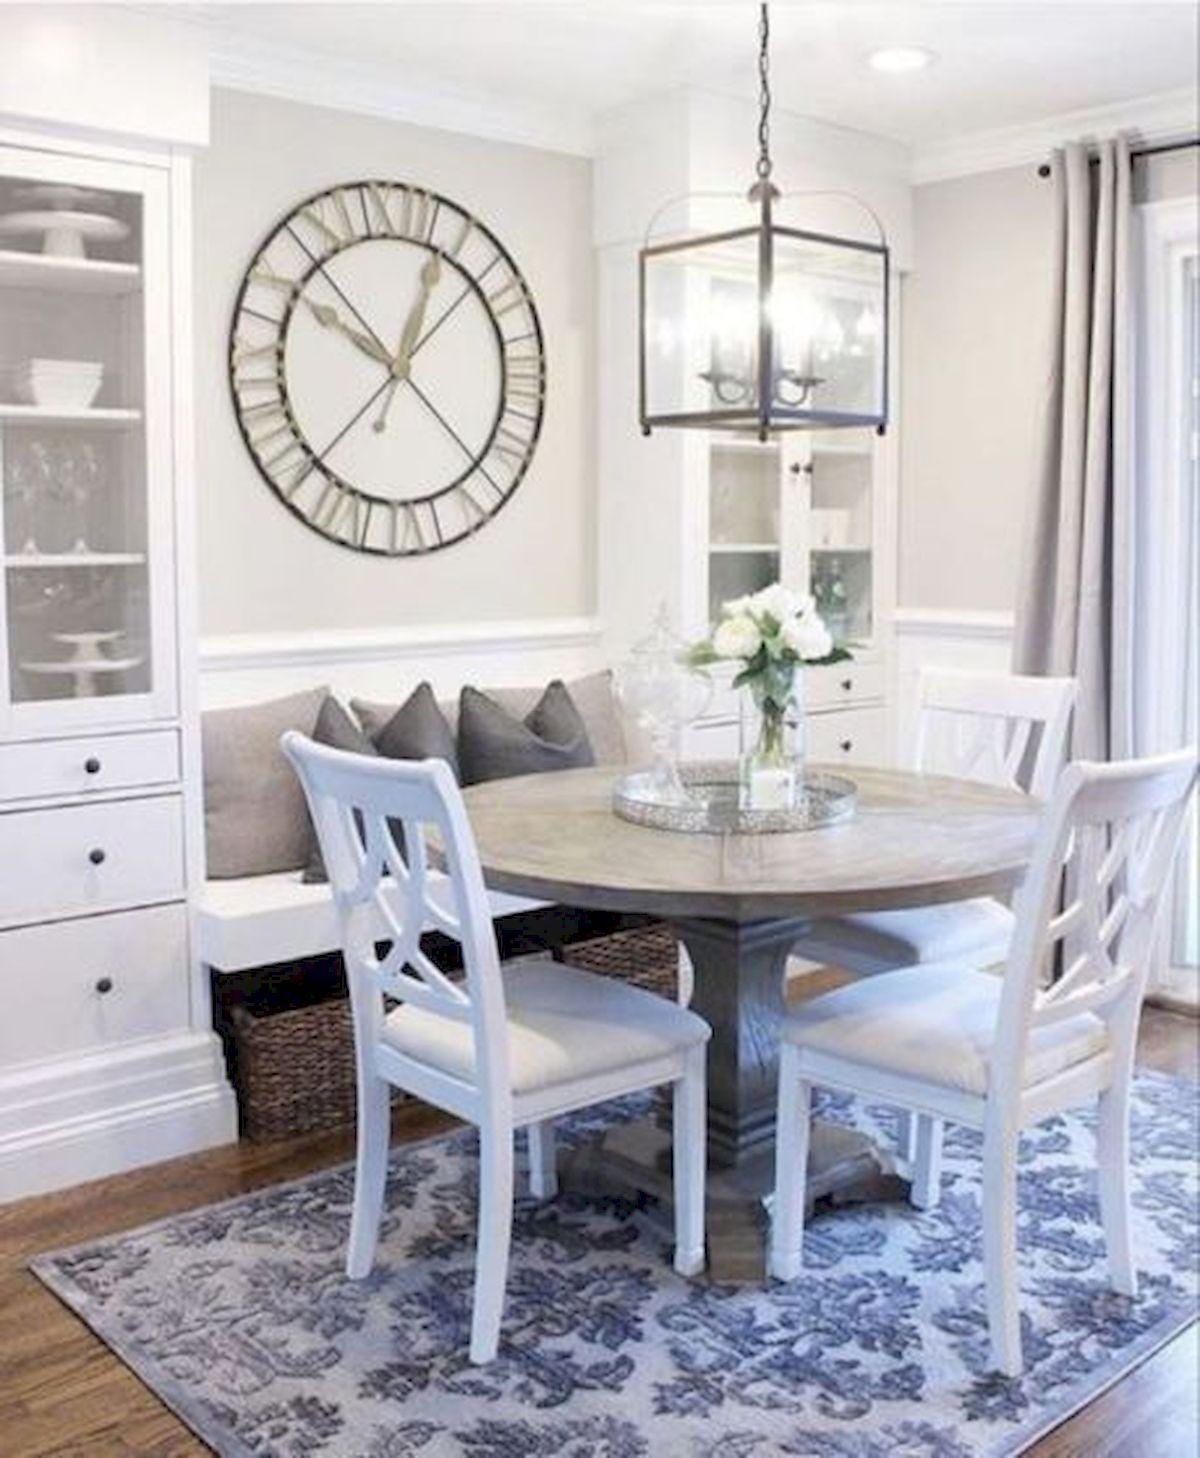 52 Beautiful Small Dining Room Ideas On A Budget Shairoom Com